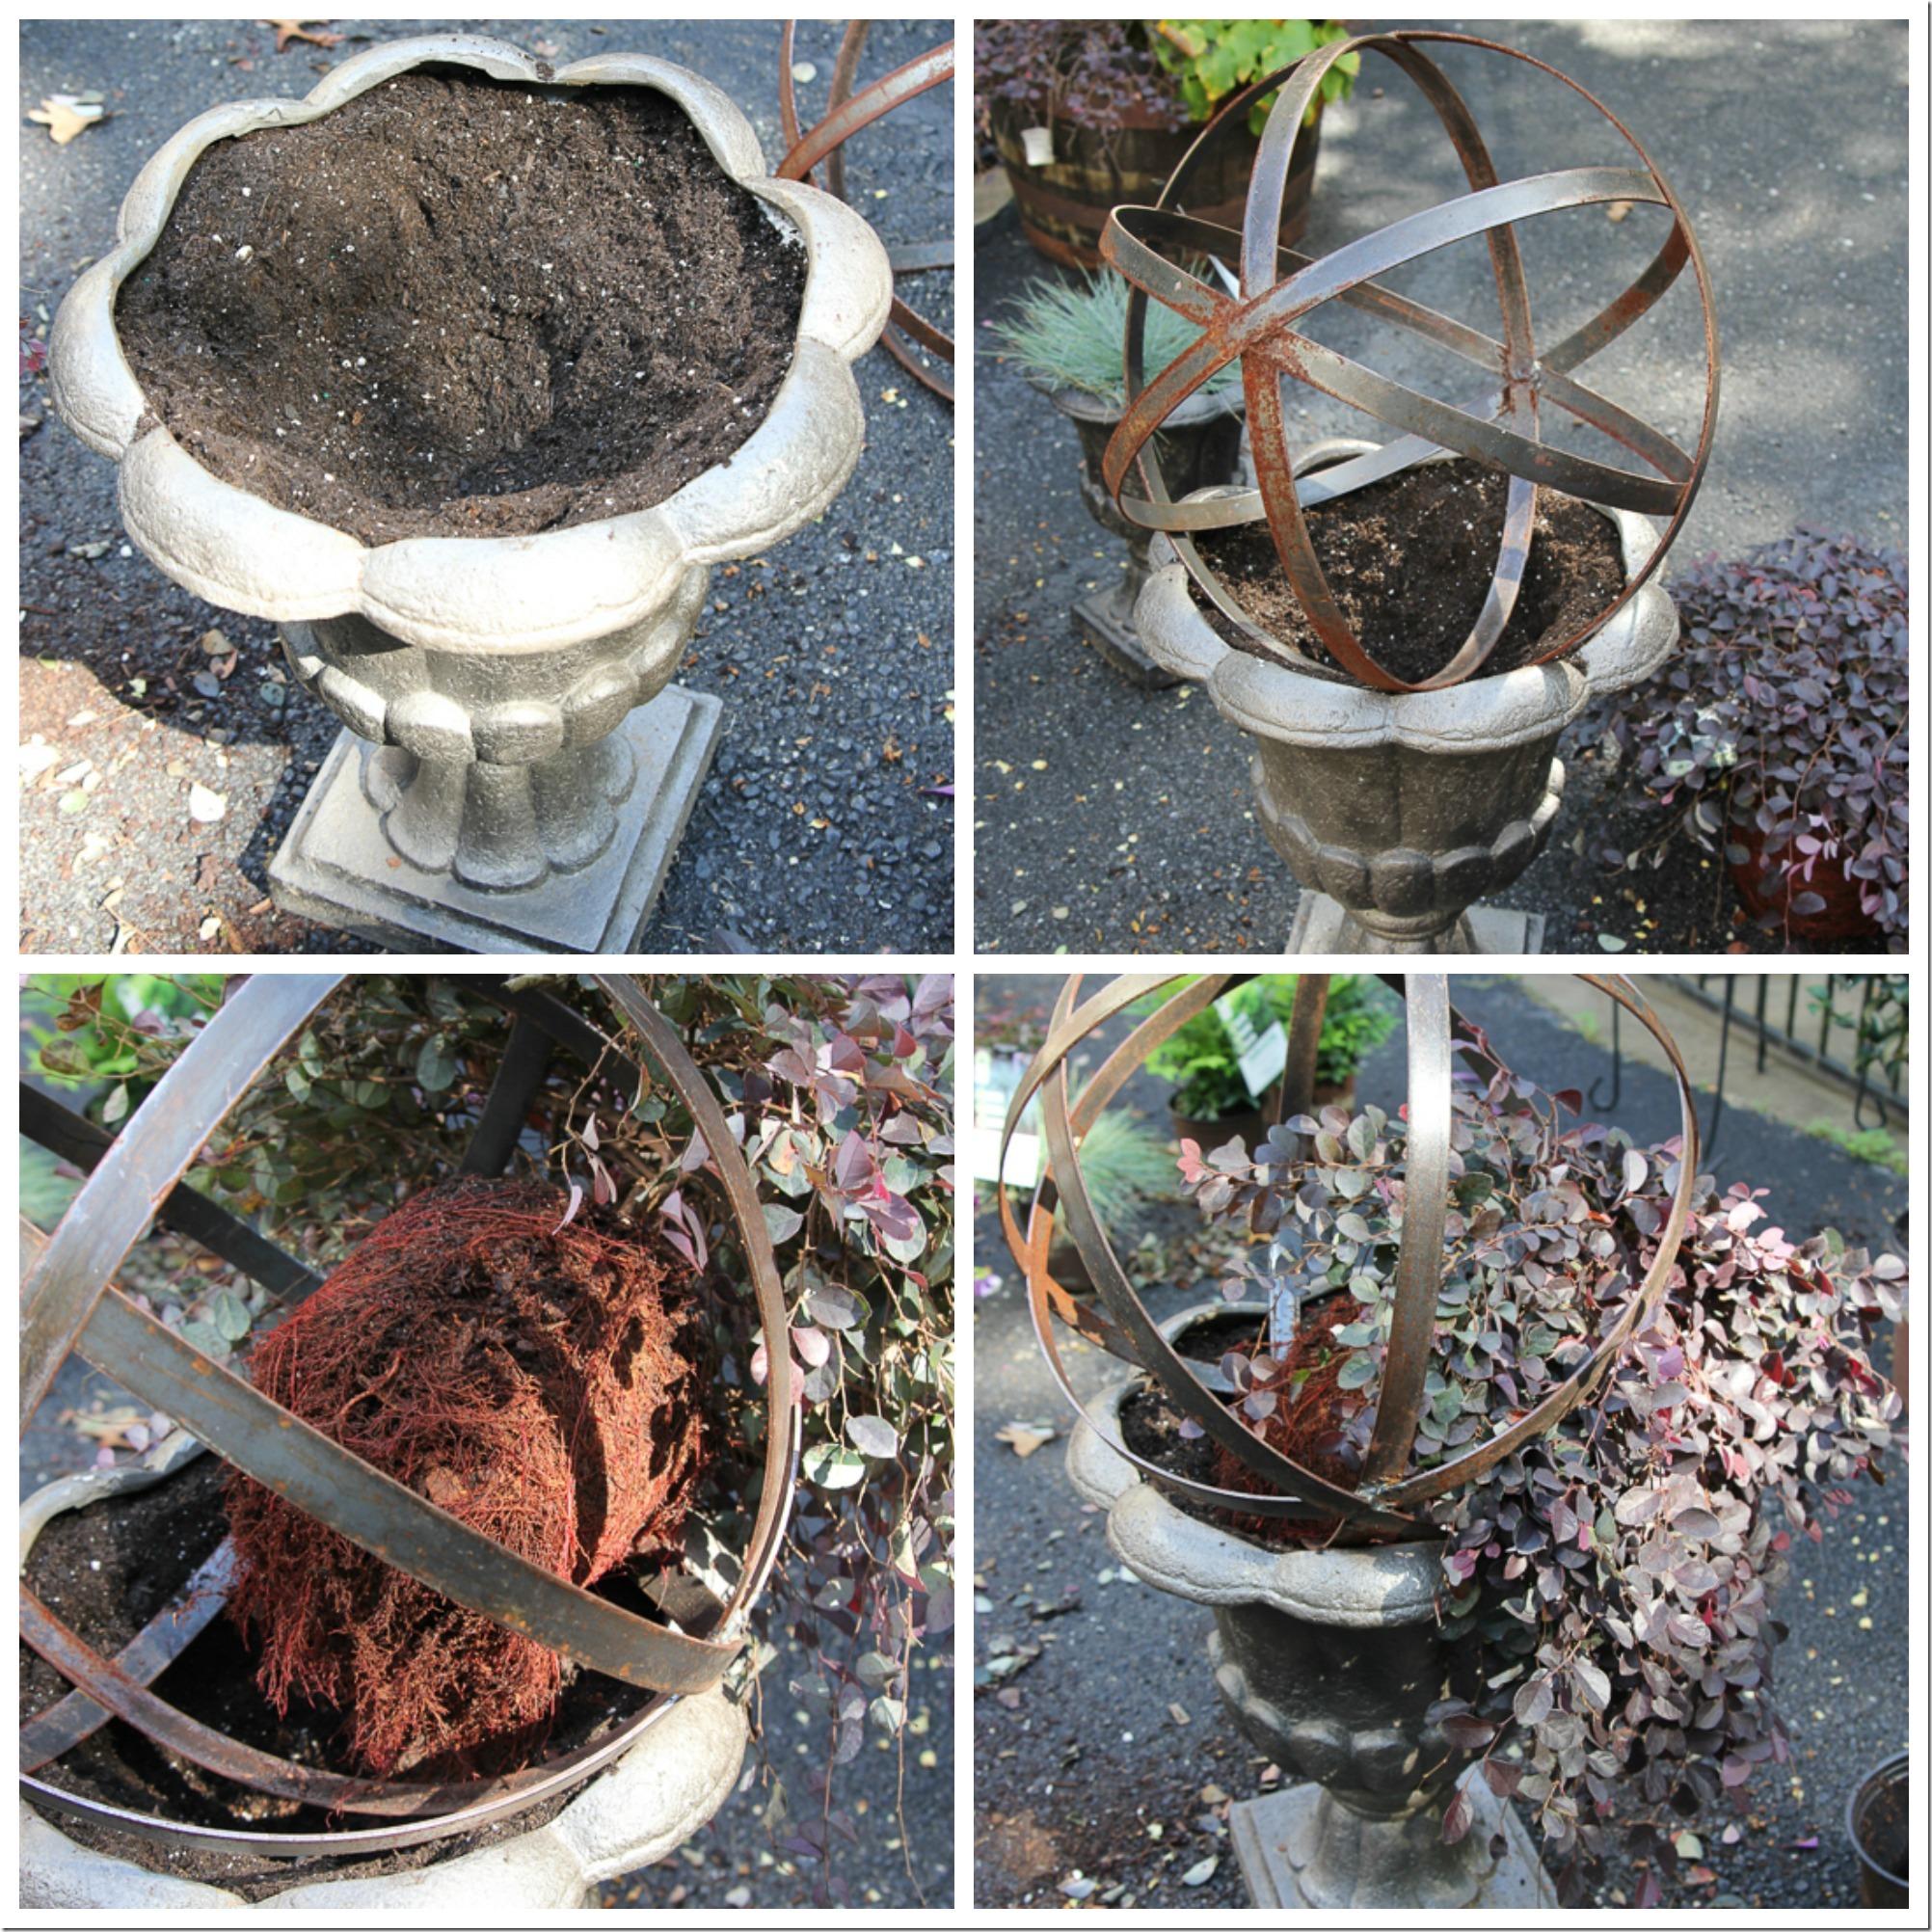 Planting inside a metal orb